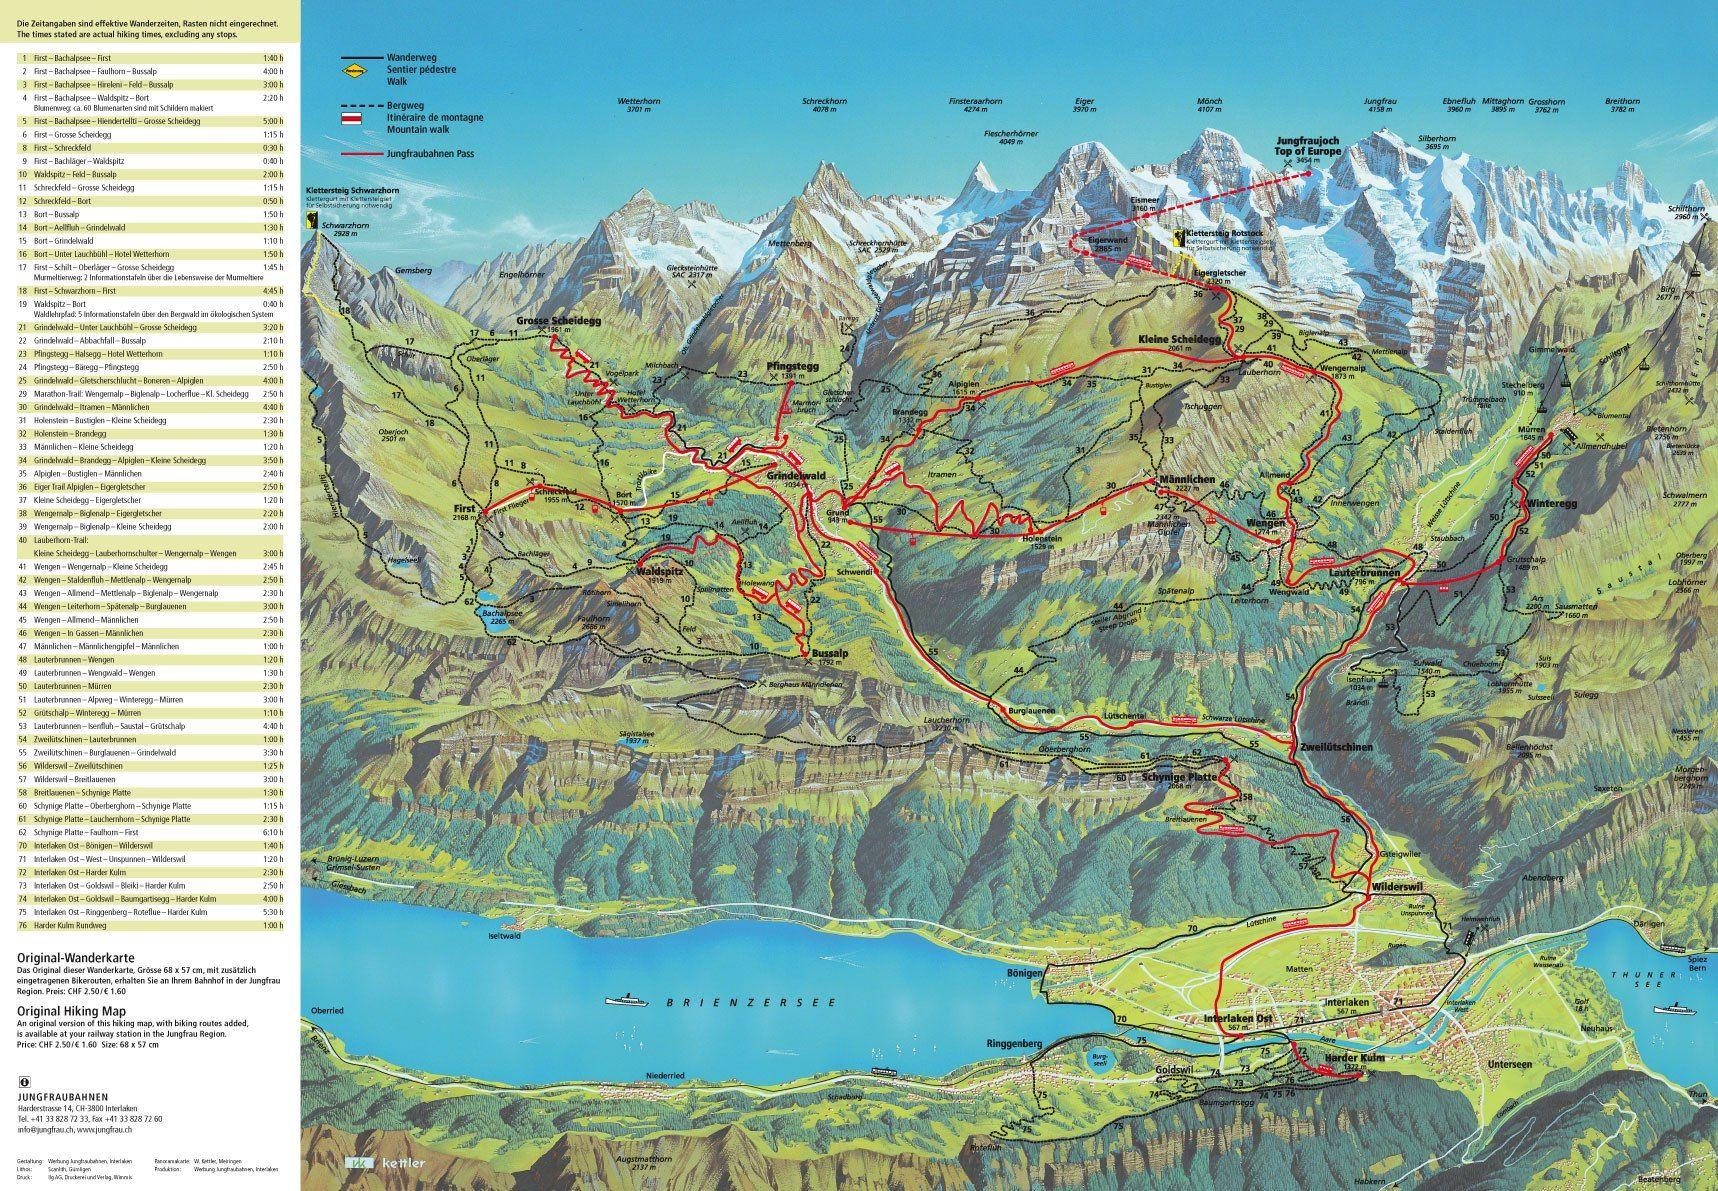 EigerJungfrau train trip inside the mountain unforgettable